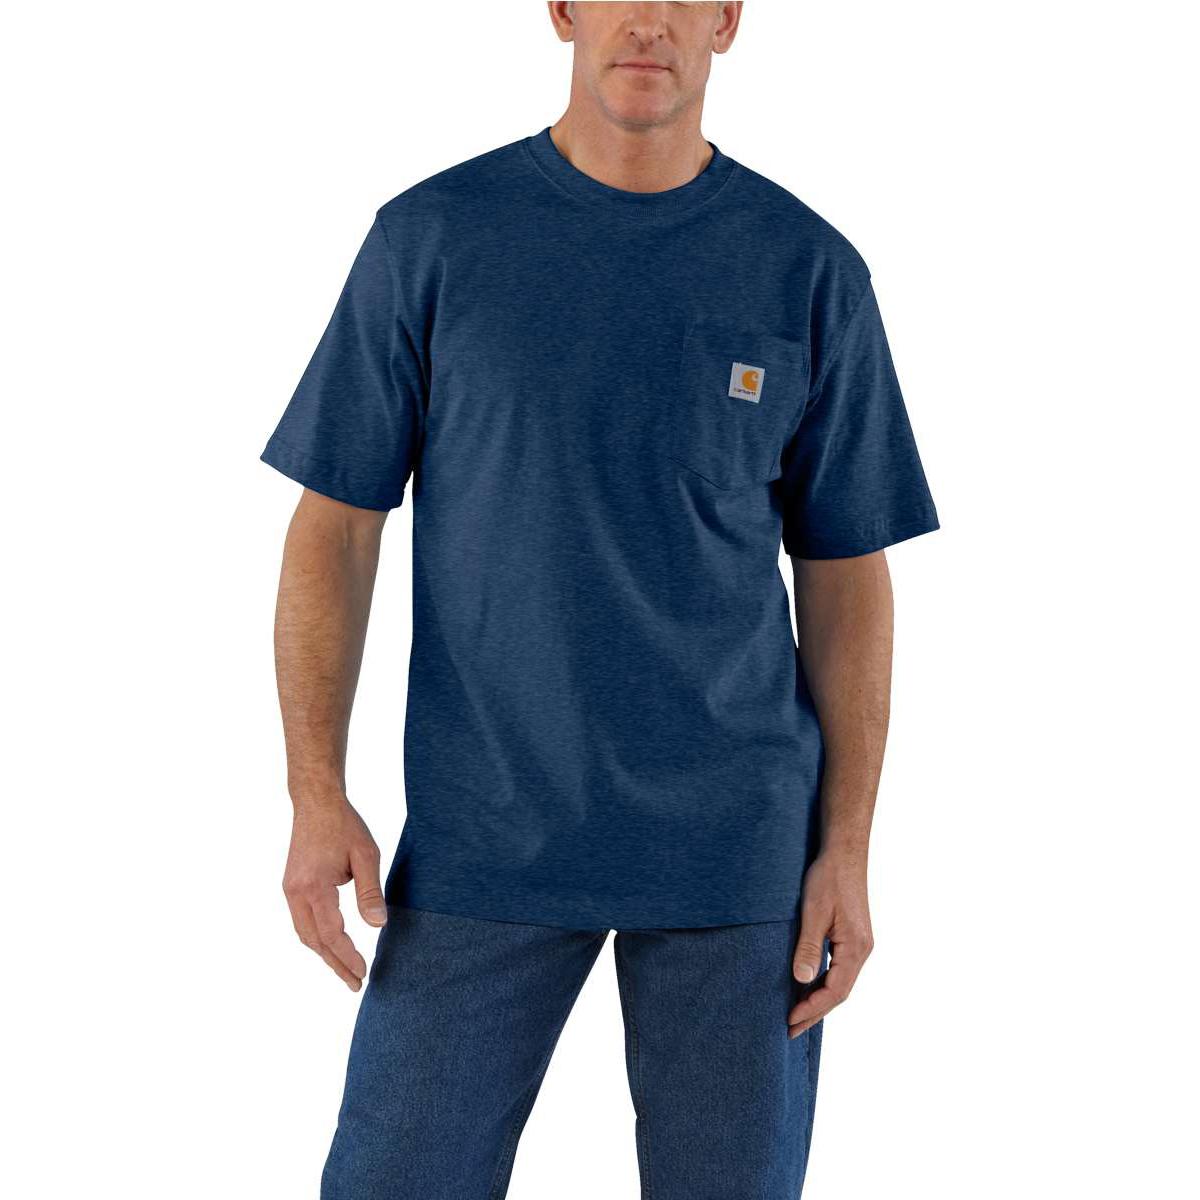 Carhartt Men's Workwear Pocket Short-Sleeve Shirt - Blue, S